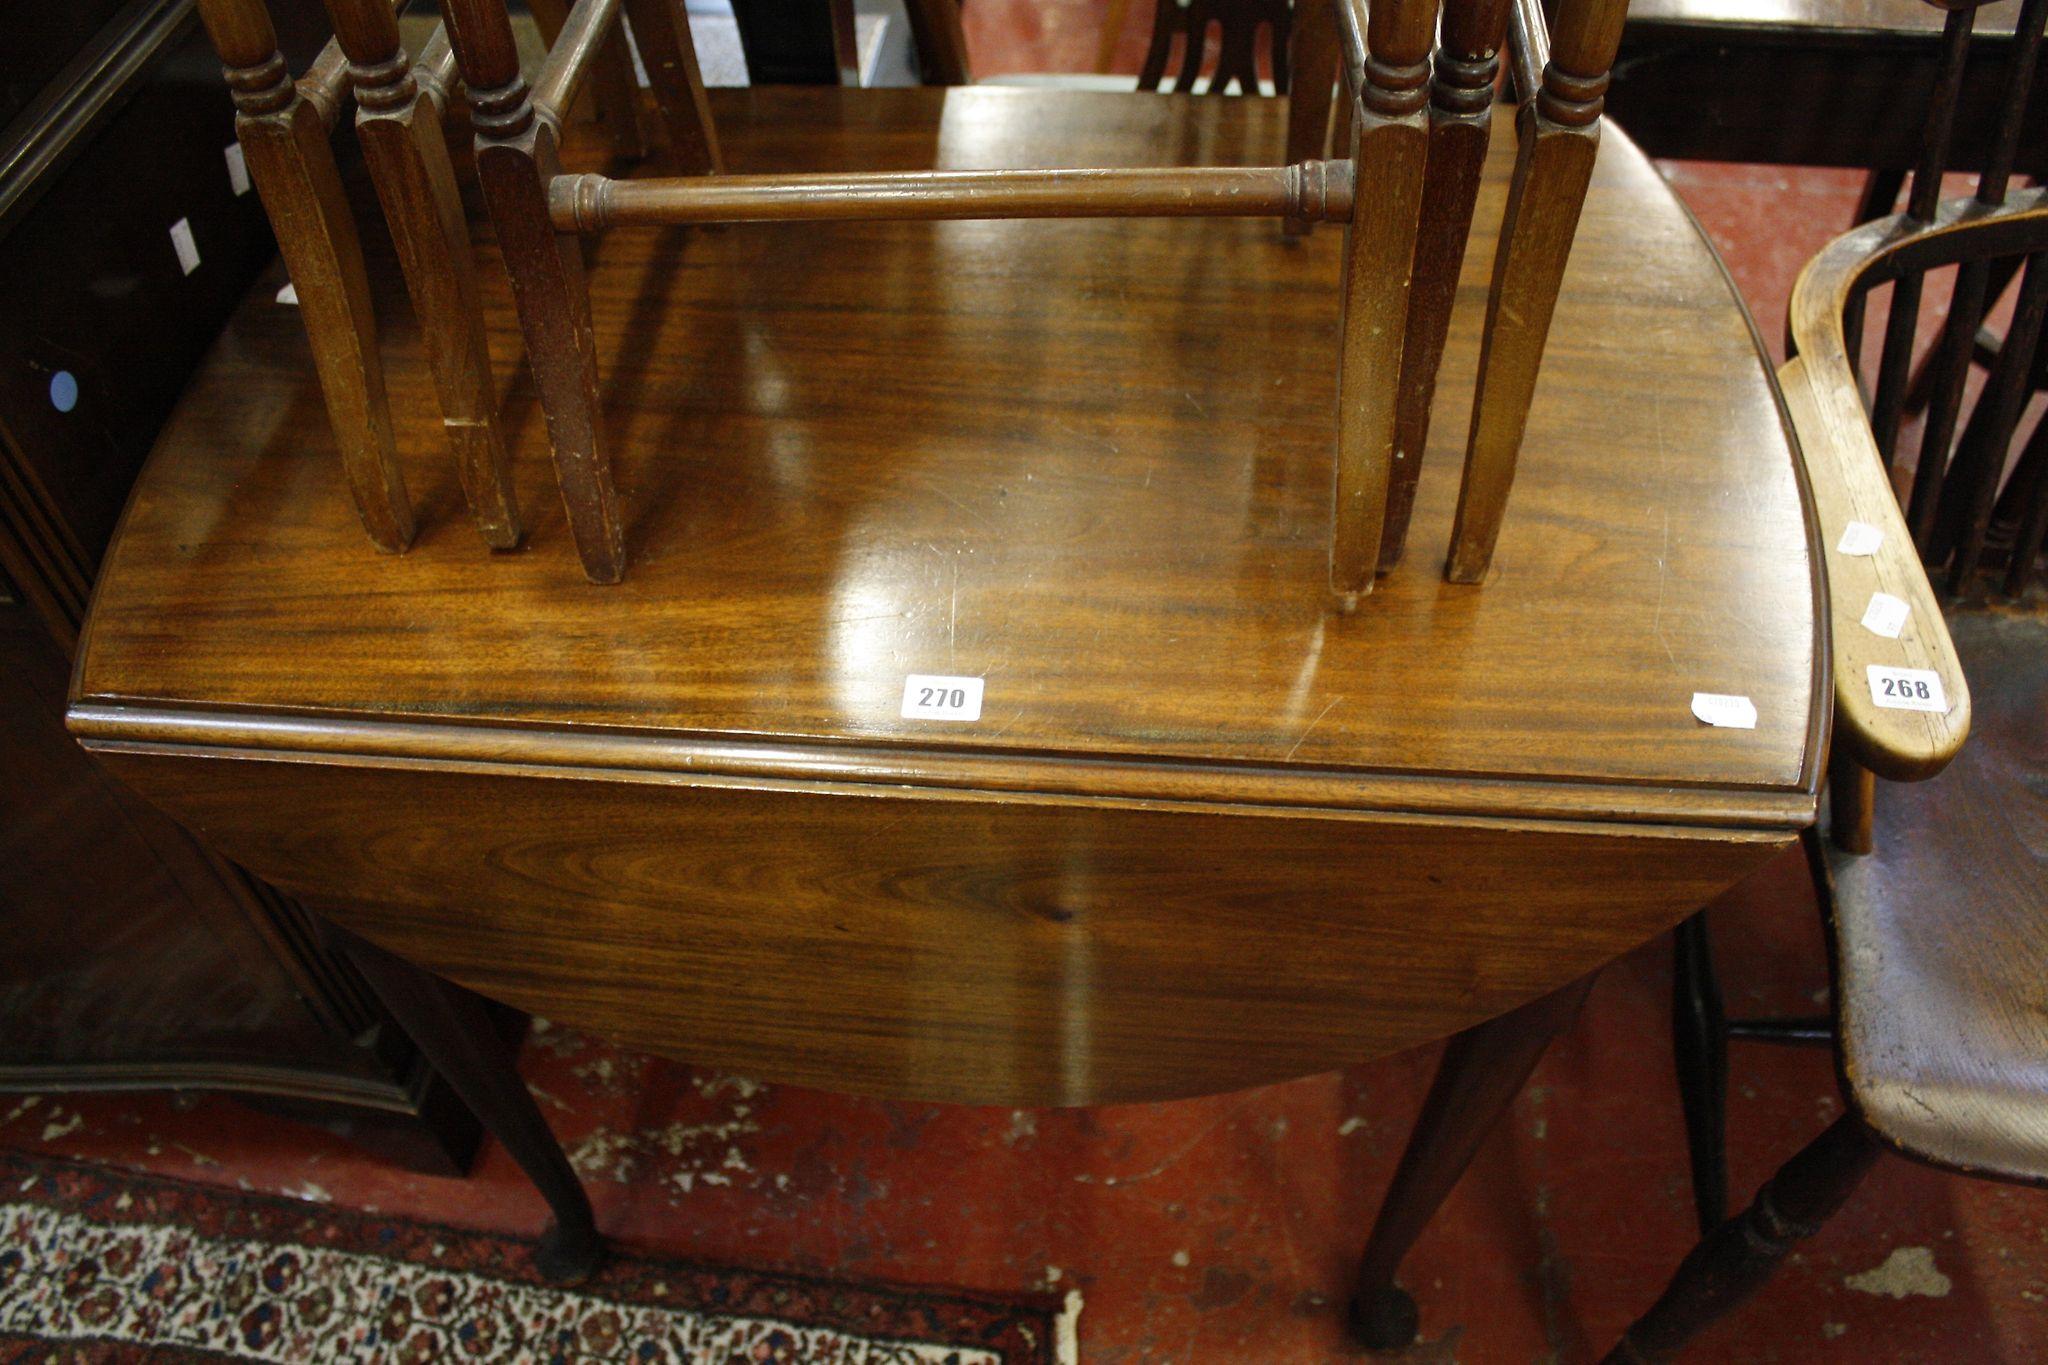 A Georgian style mahogany oval drop leaf table